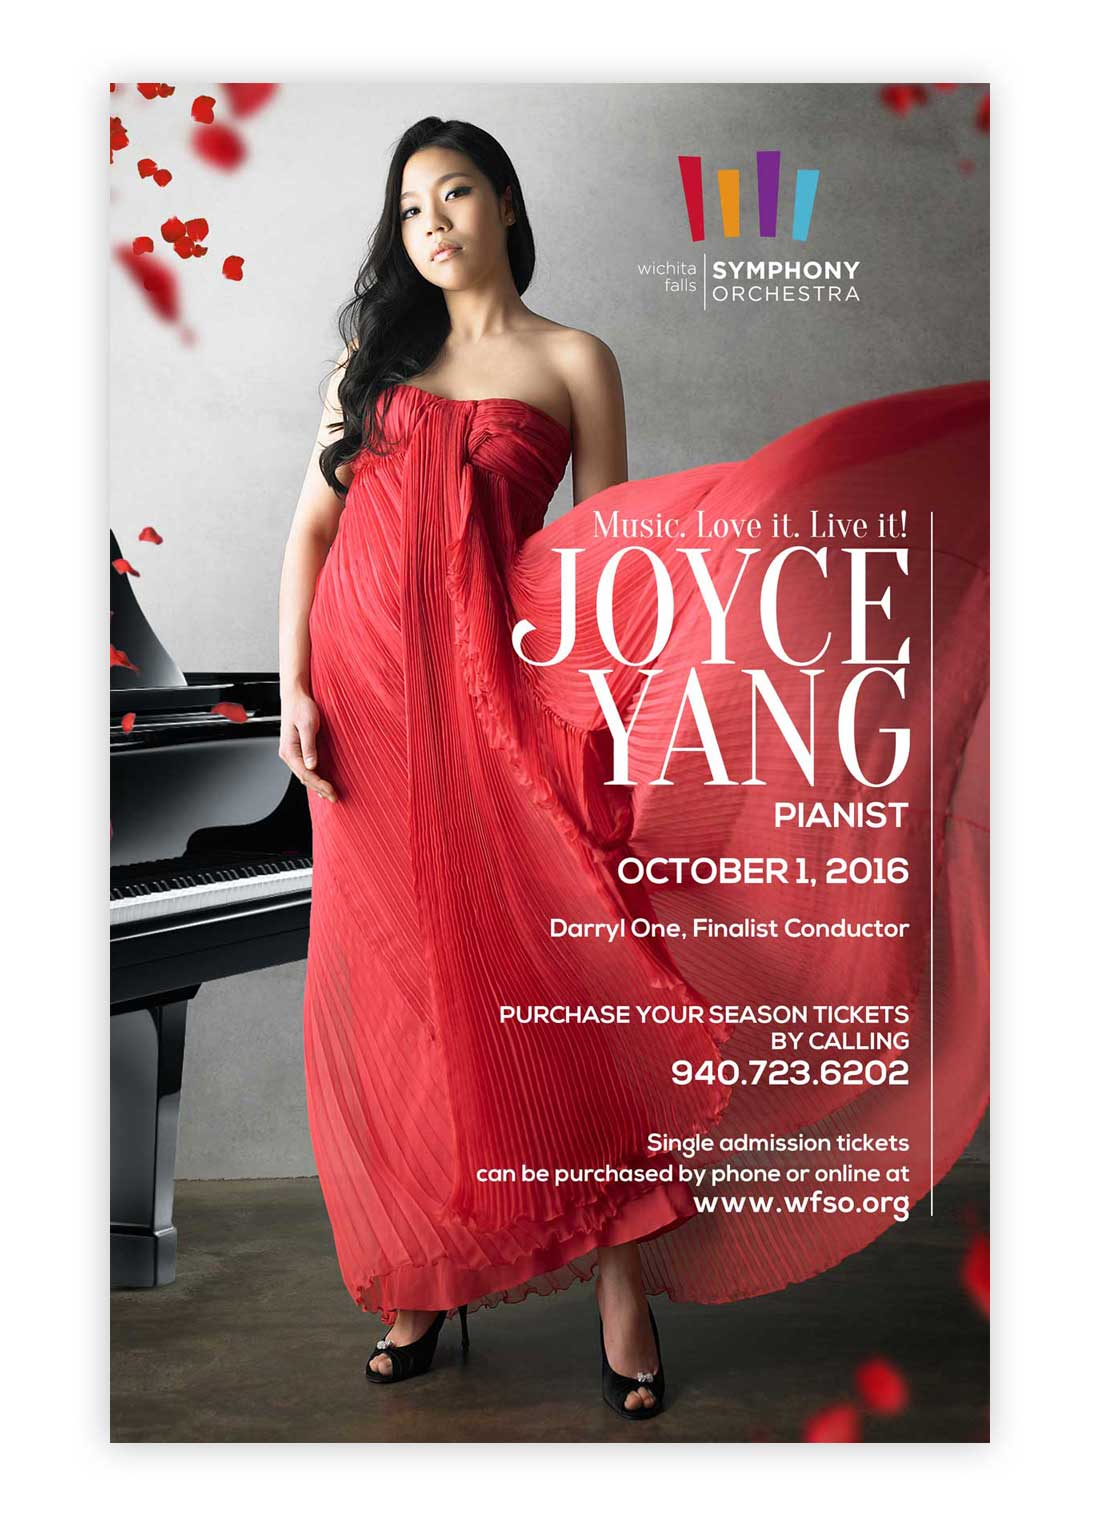 Joyce Yang Music Concert Poster Design